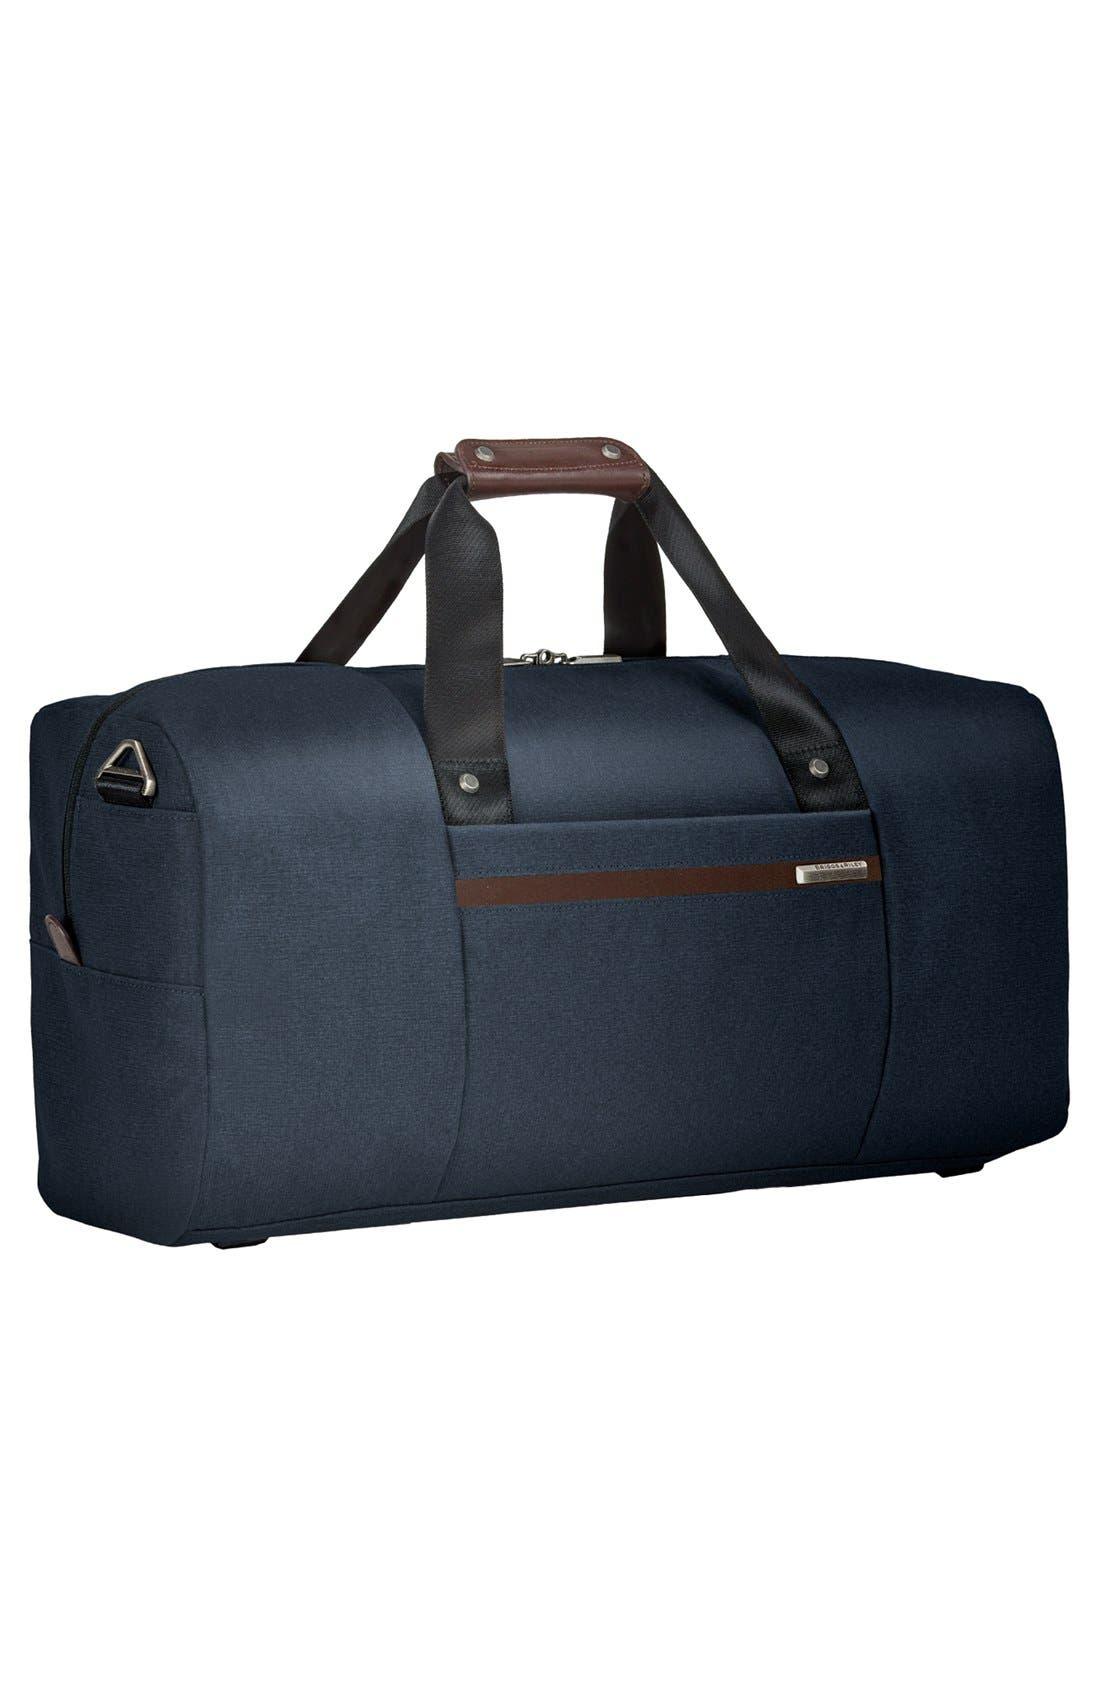 Kinzie Street - Simple Duffel Bag,                             Alternate thumbnail 4, color,                             410